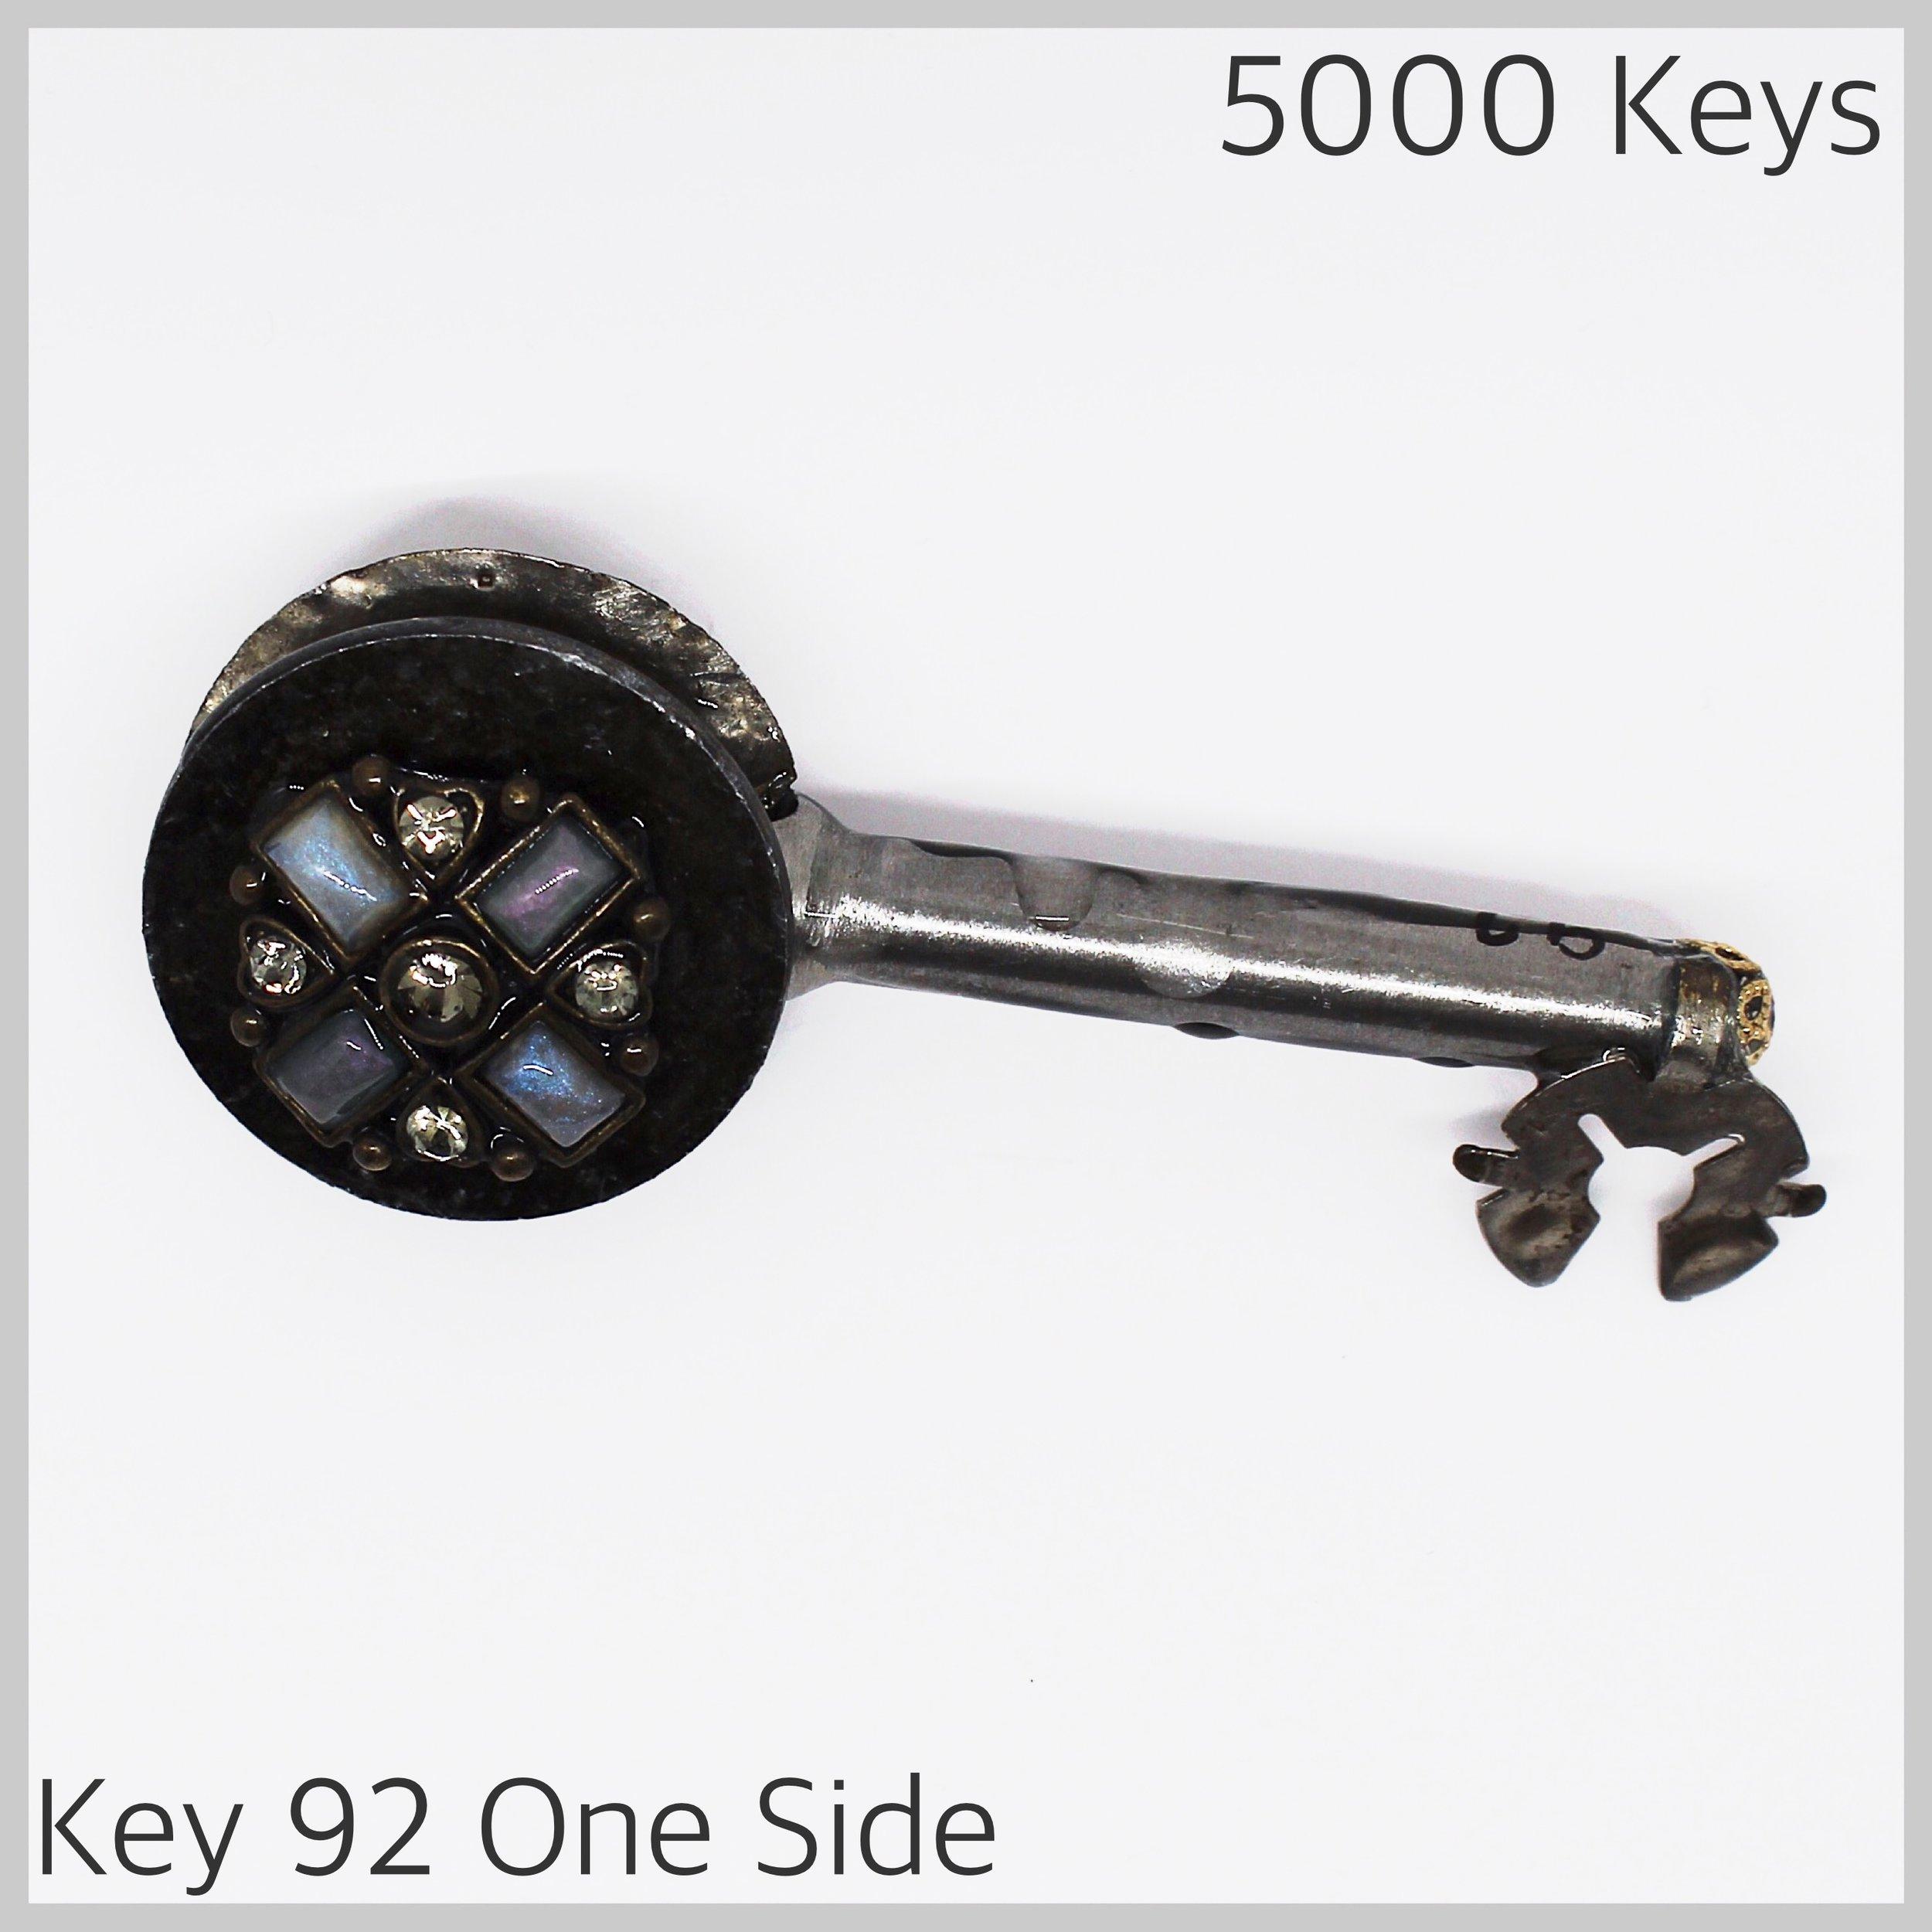 Key 92 one side.JPG